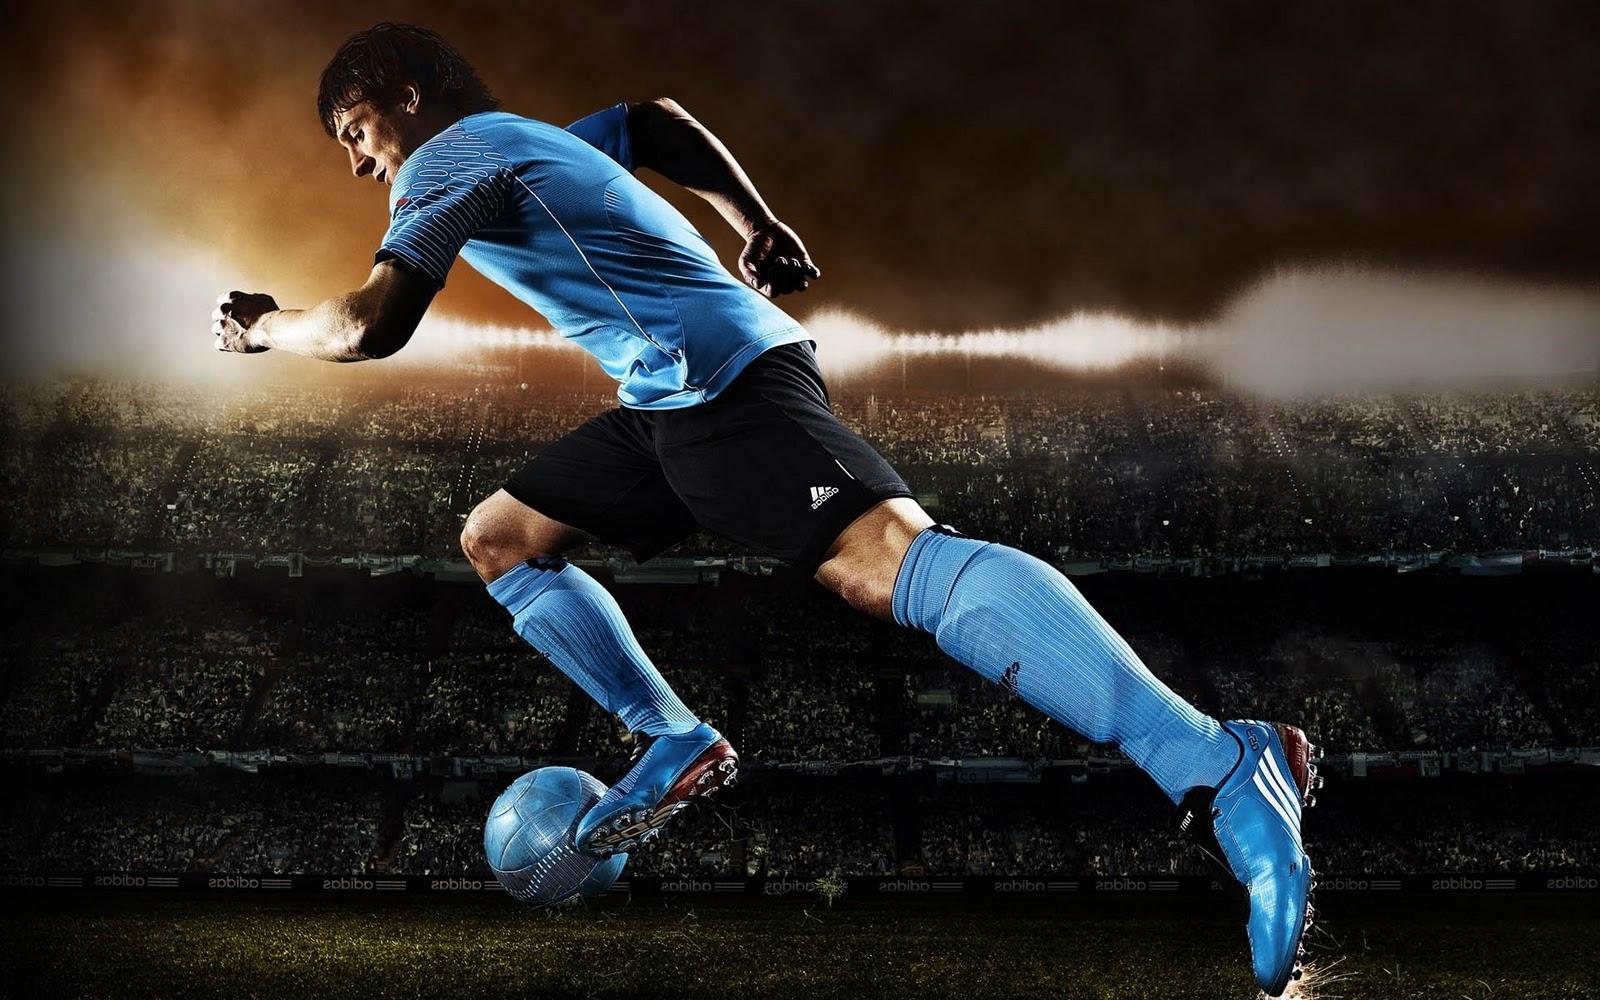 Best Sports Wallpapers Wallpapersafari